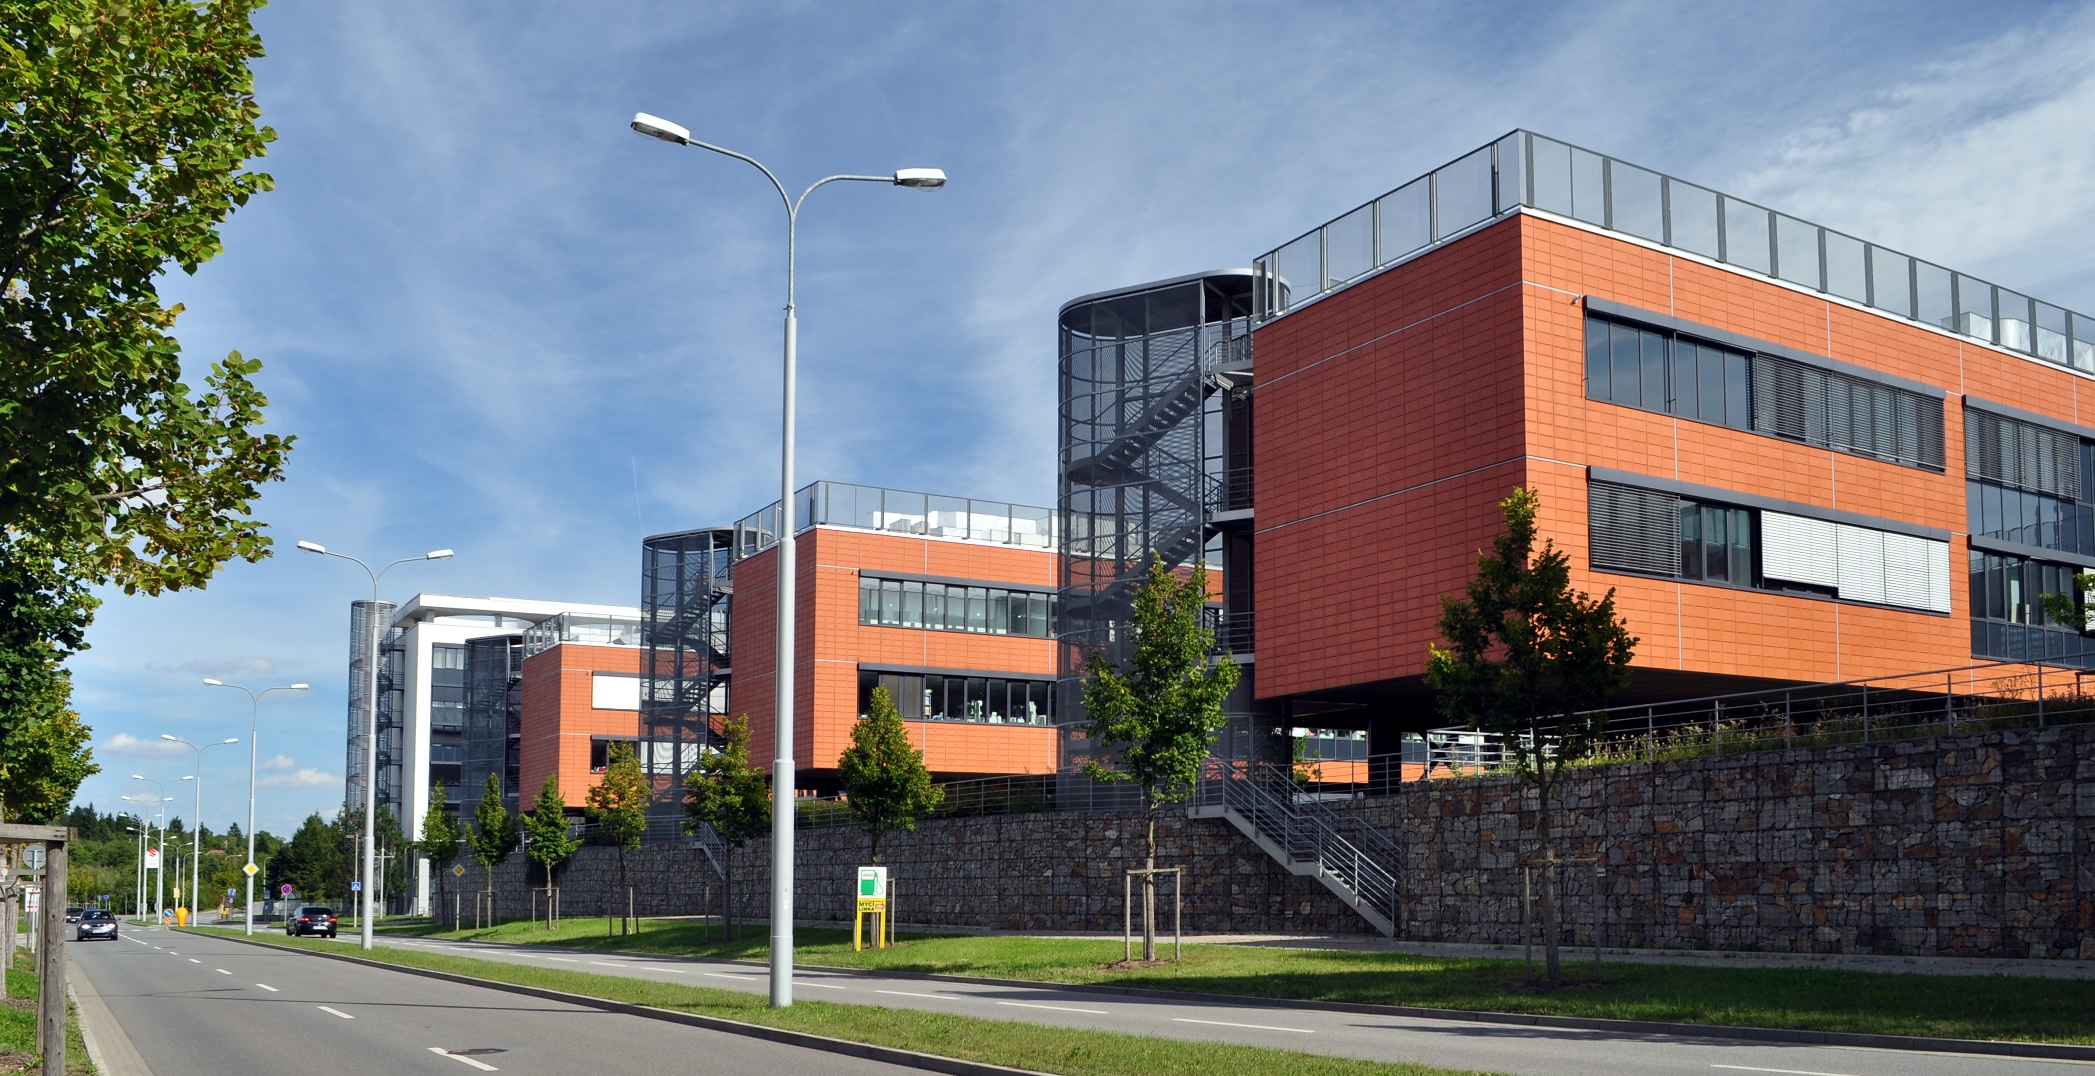 Brno_-_Masaryk_University_Campus_II.jpg